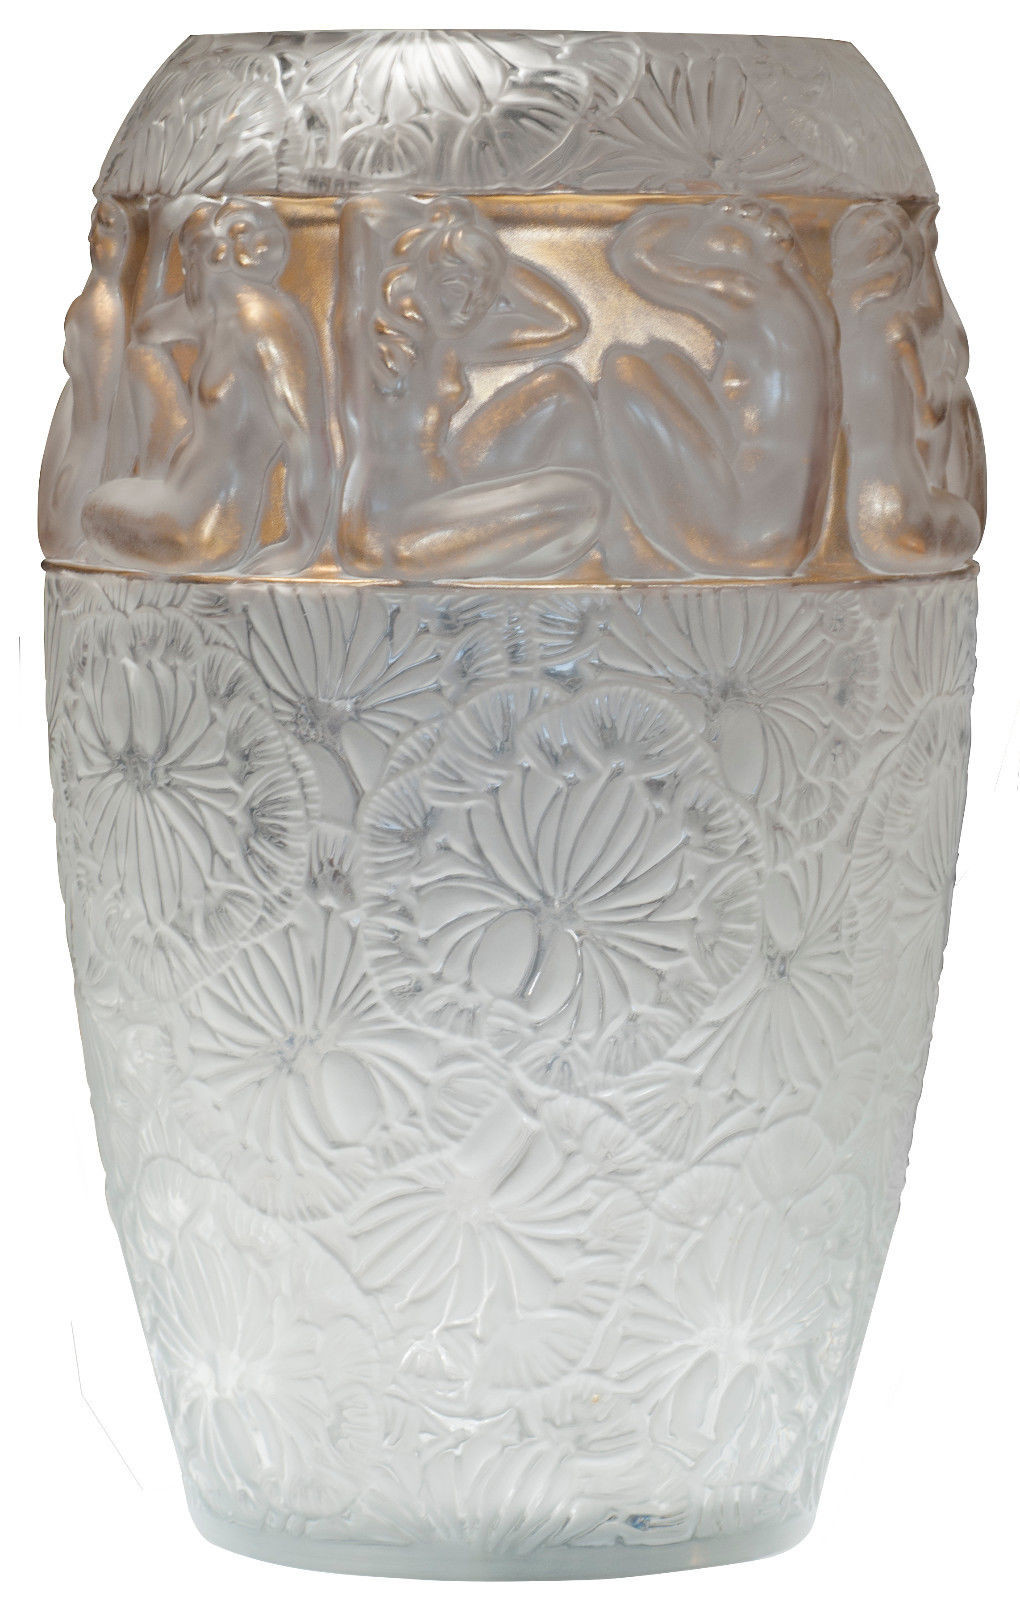 16 Wonderful Lalique Vase with Doves 2021 free download lalique vase with doves of lalique french art glass angelique vase clear gold guilding glass with regard to lalique french art glass angelique vase clear gold guilding glass limited ed